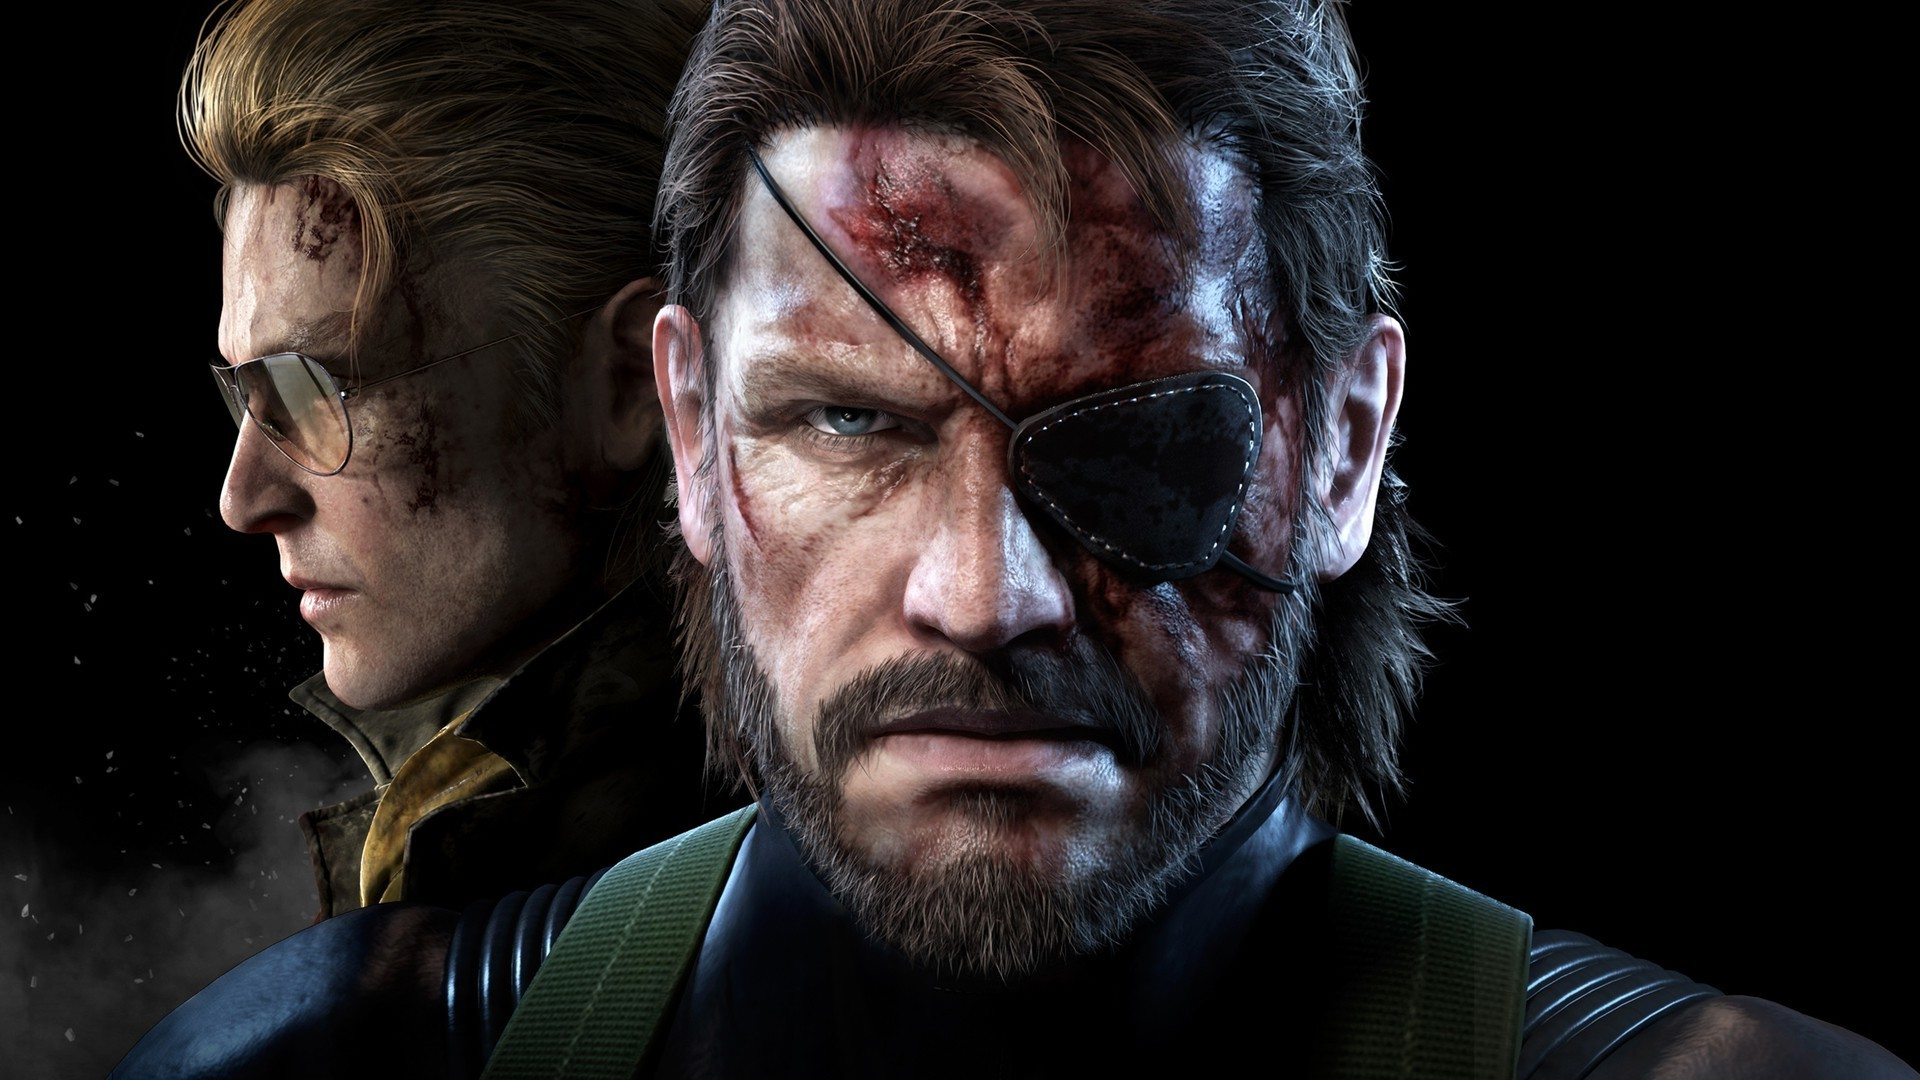 metal Gear Solid 5, Video Games Wallpapers HD / Desktop and Mobile .